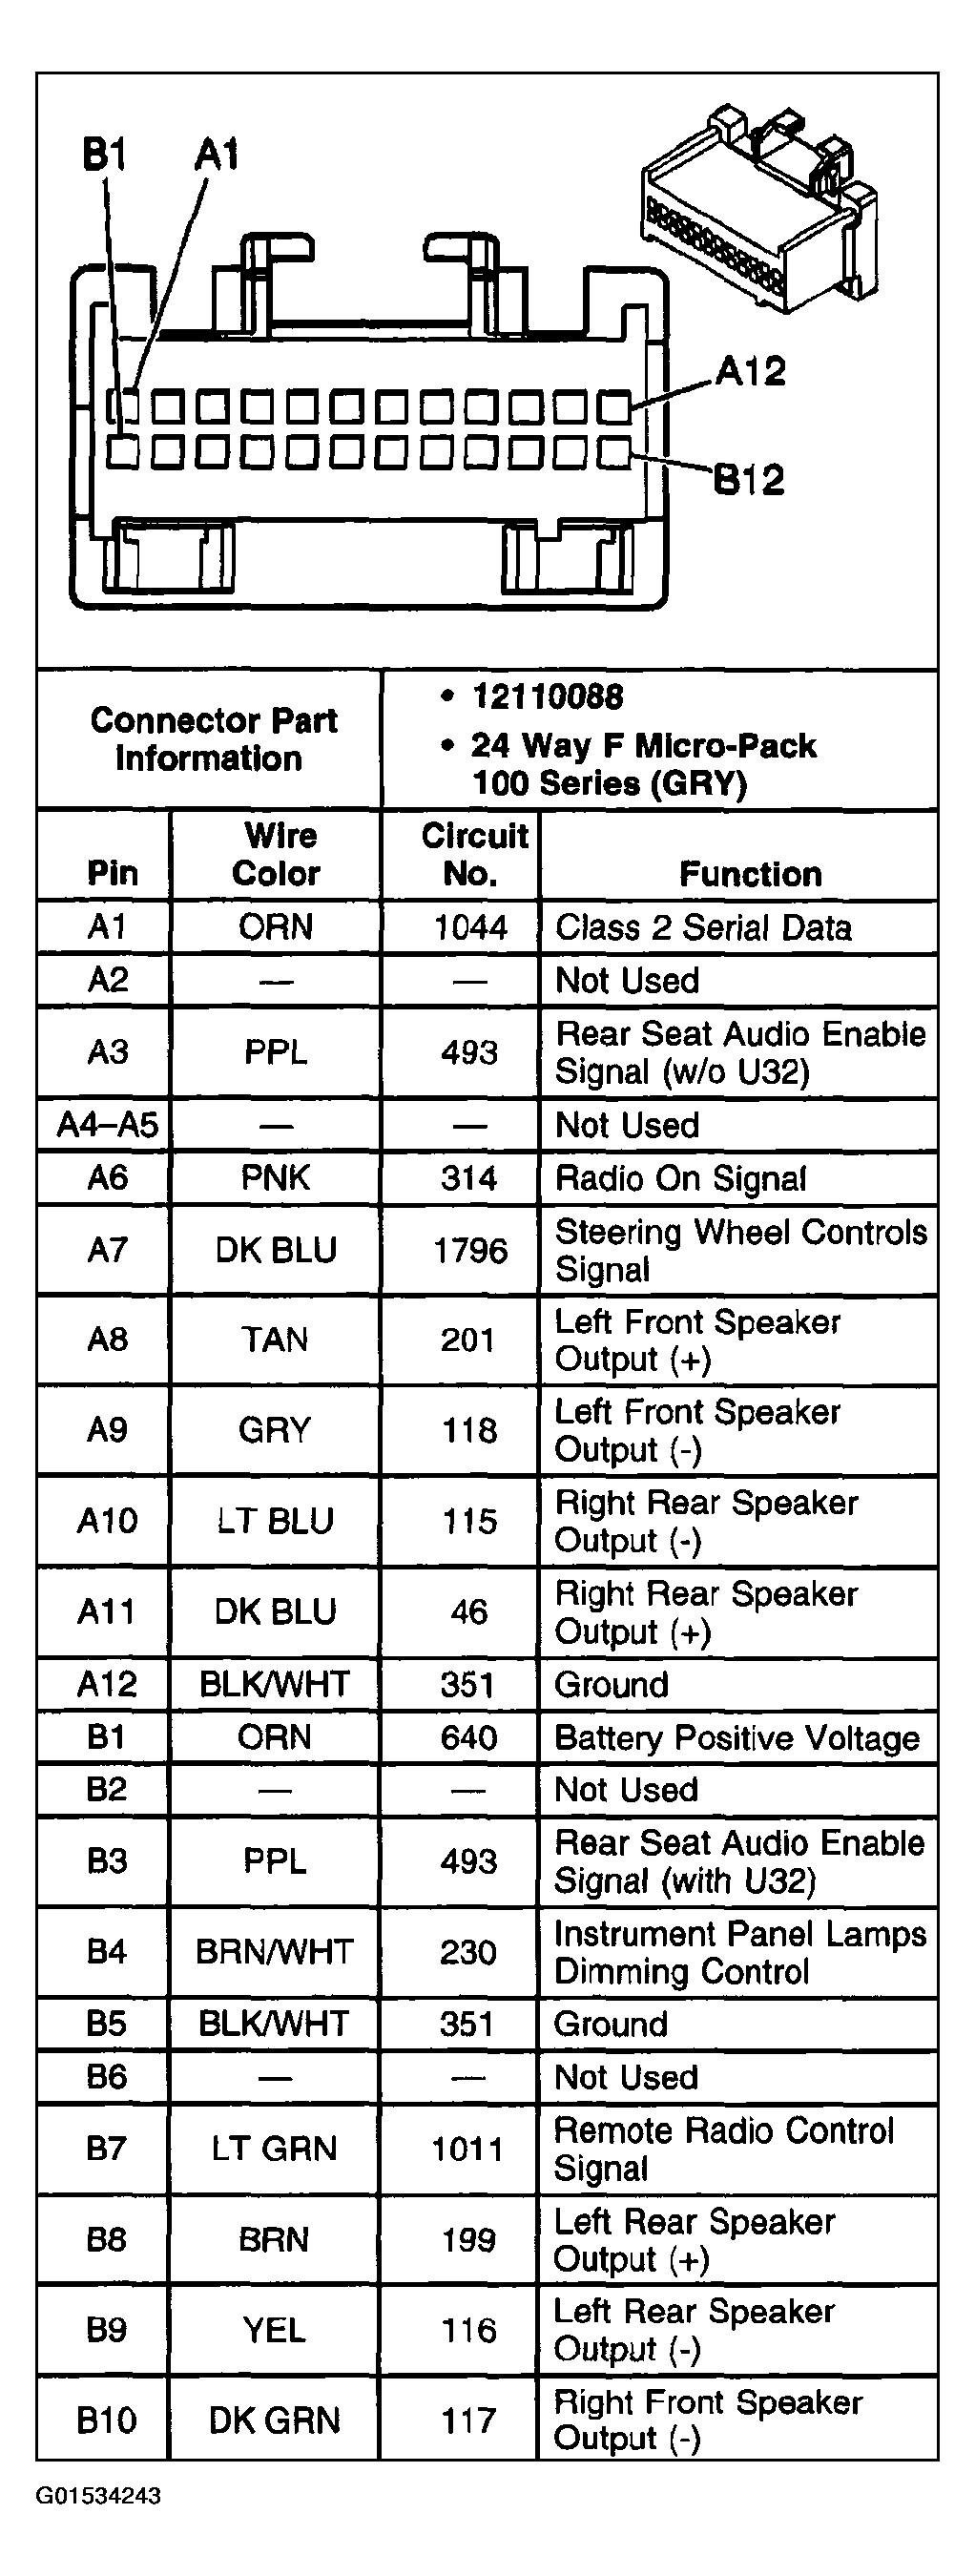 2000 Impala Radio Wiring Diagram Fresh 7 2002 Chevy Trailblazer - 2002 Chevy Trailblazer Radio Wiring Diagram